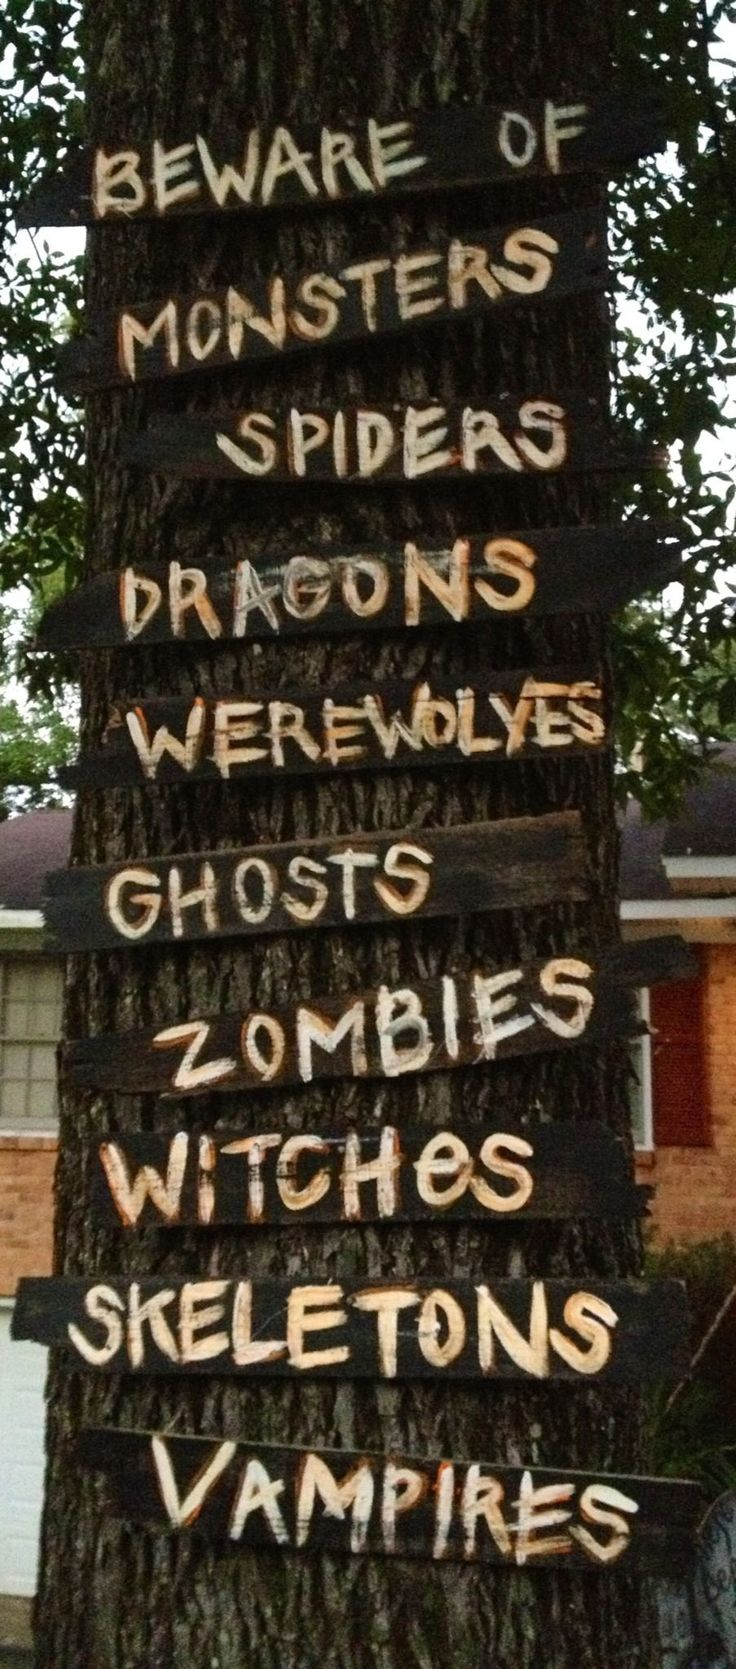 Wood Smoke and Pumpkins 1001 in 2020 Halloween diy